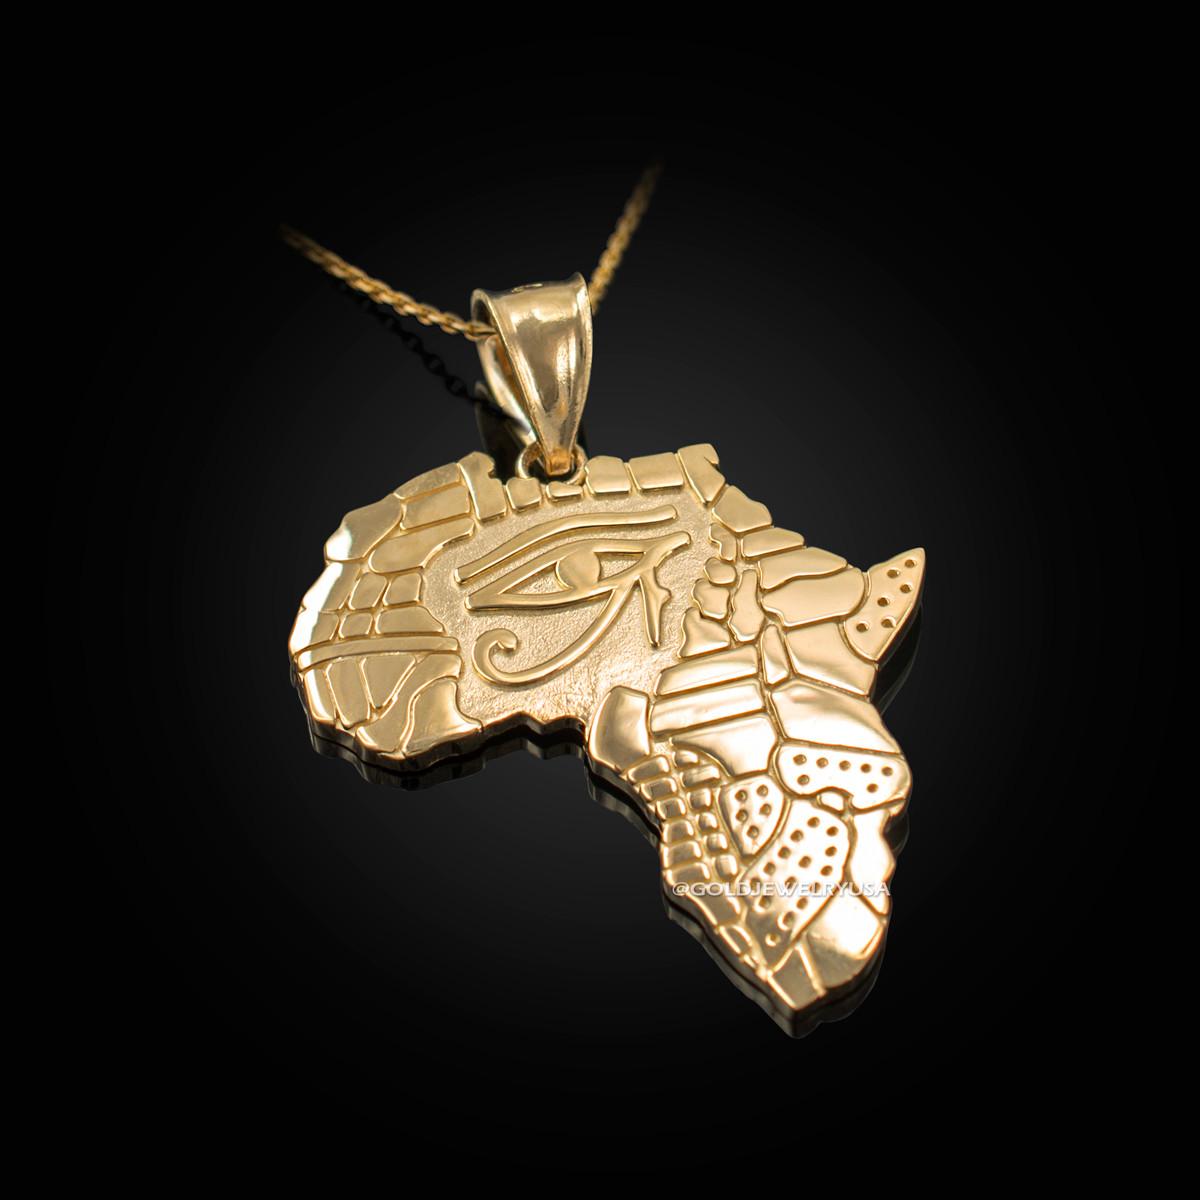 14k Yellow Gold Egyptian Protect Eye of Horus Turquoise Stone Pendant Necklace